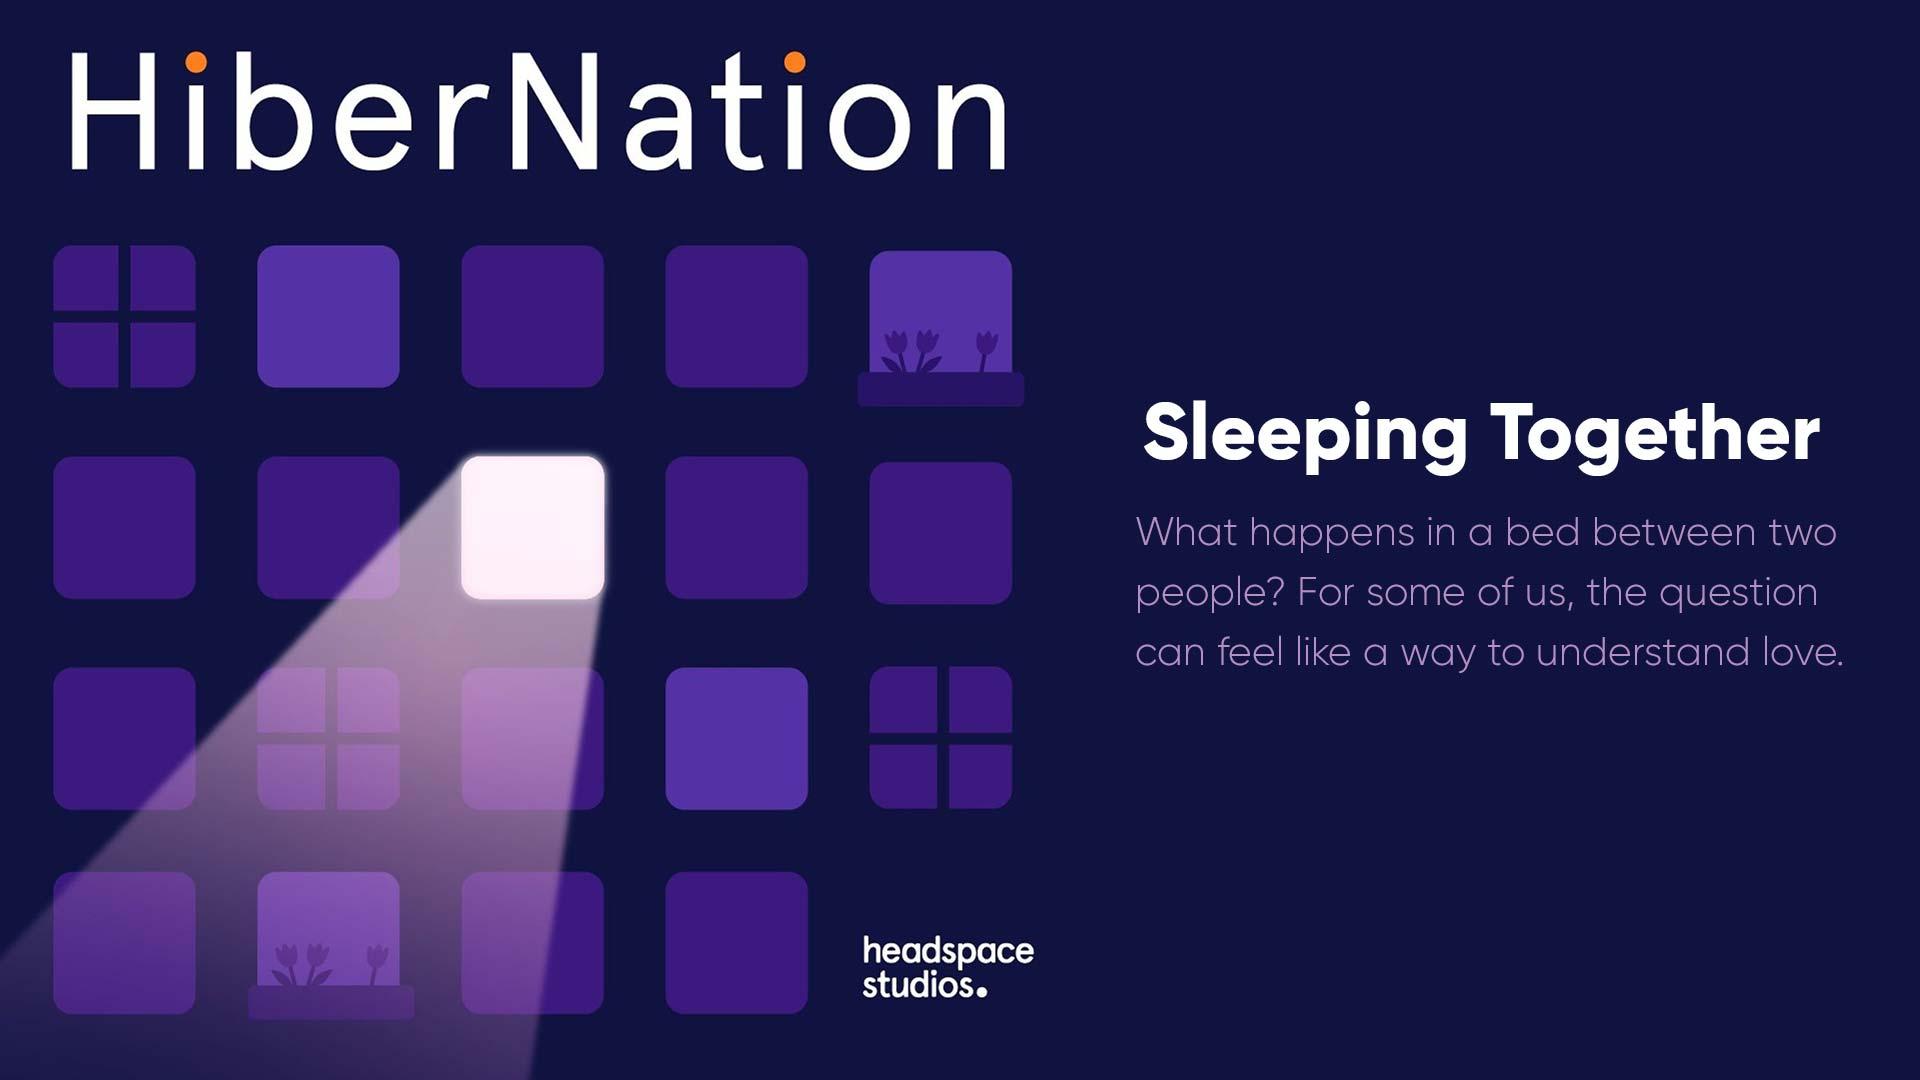 HiberNation - Sleeping Together